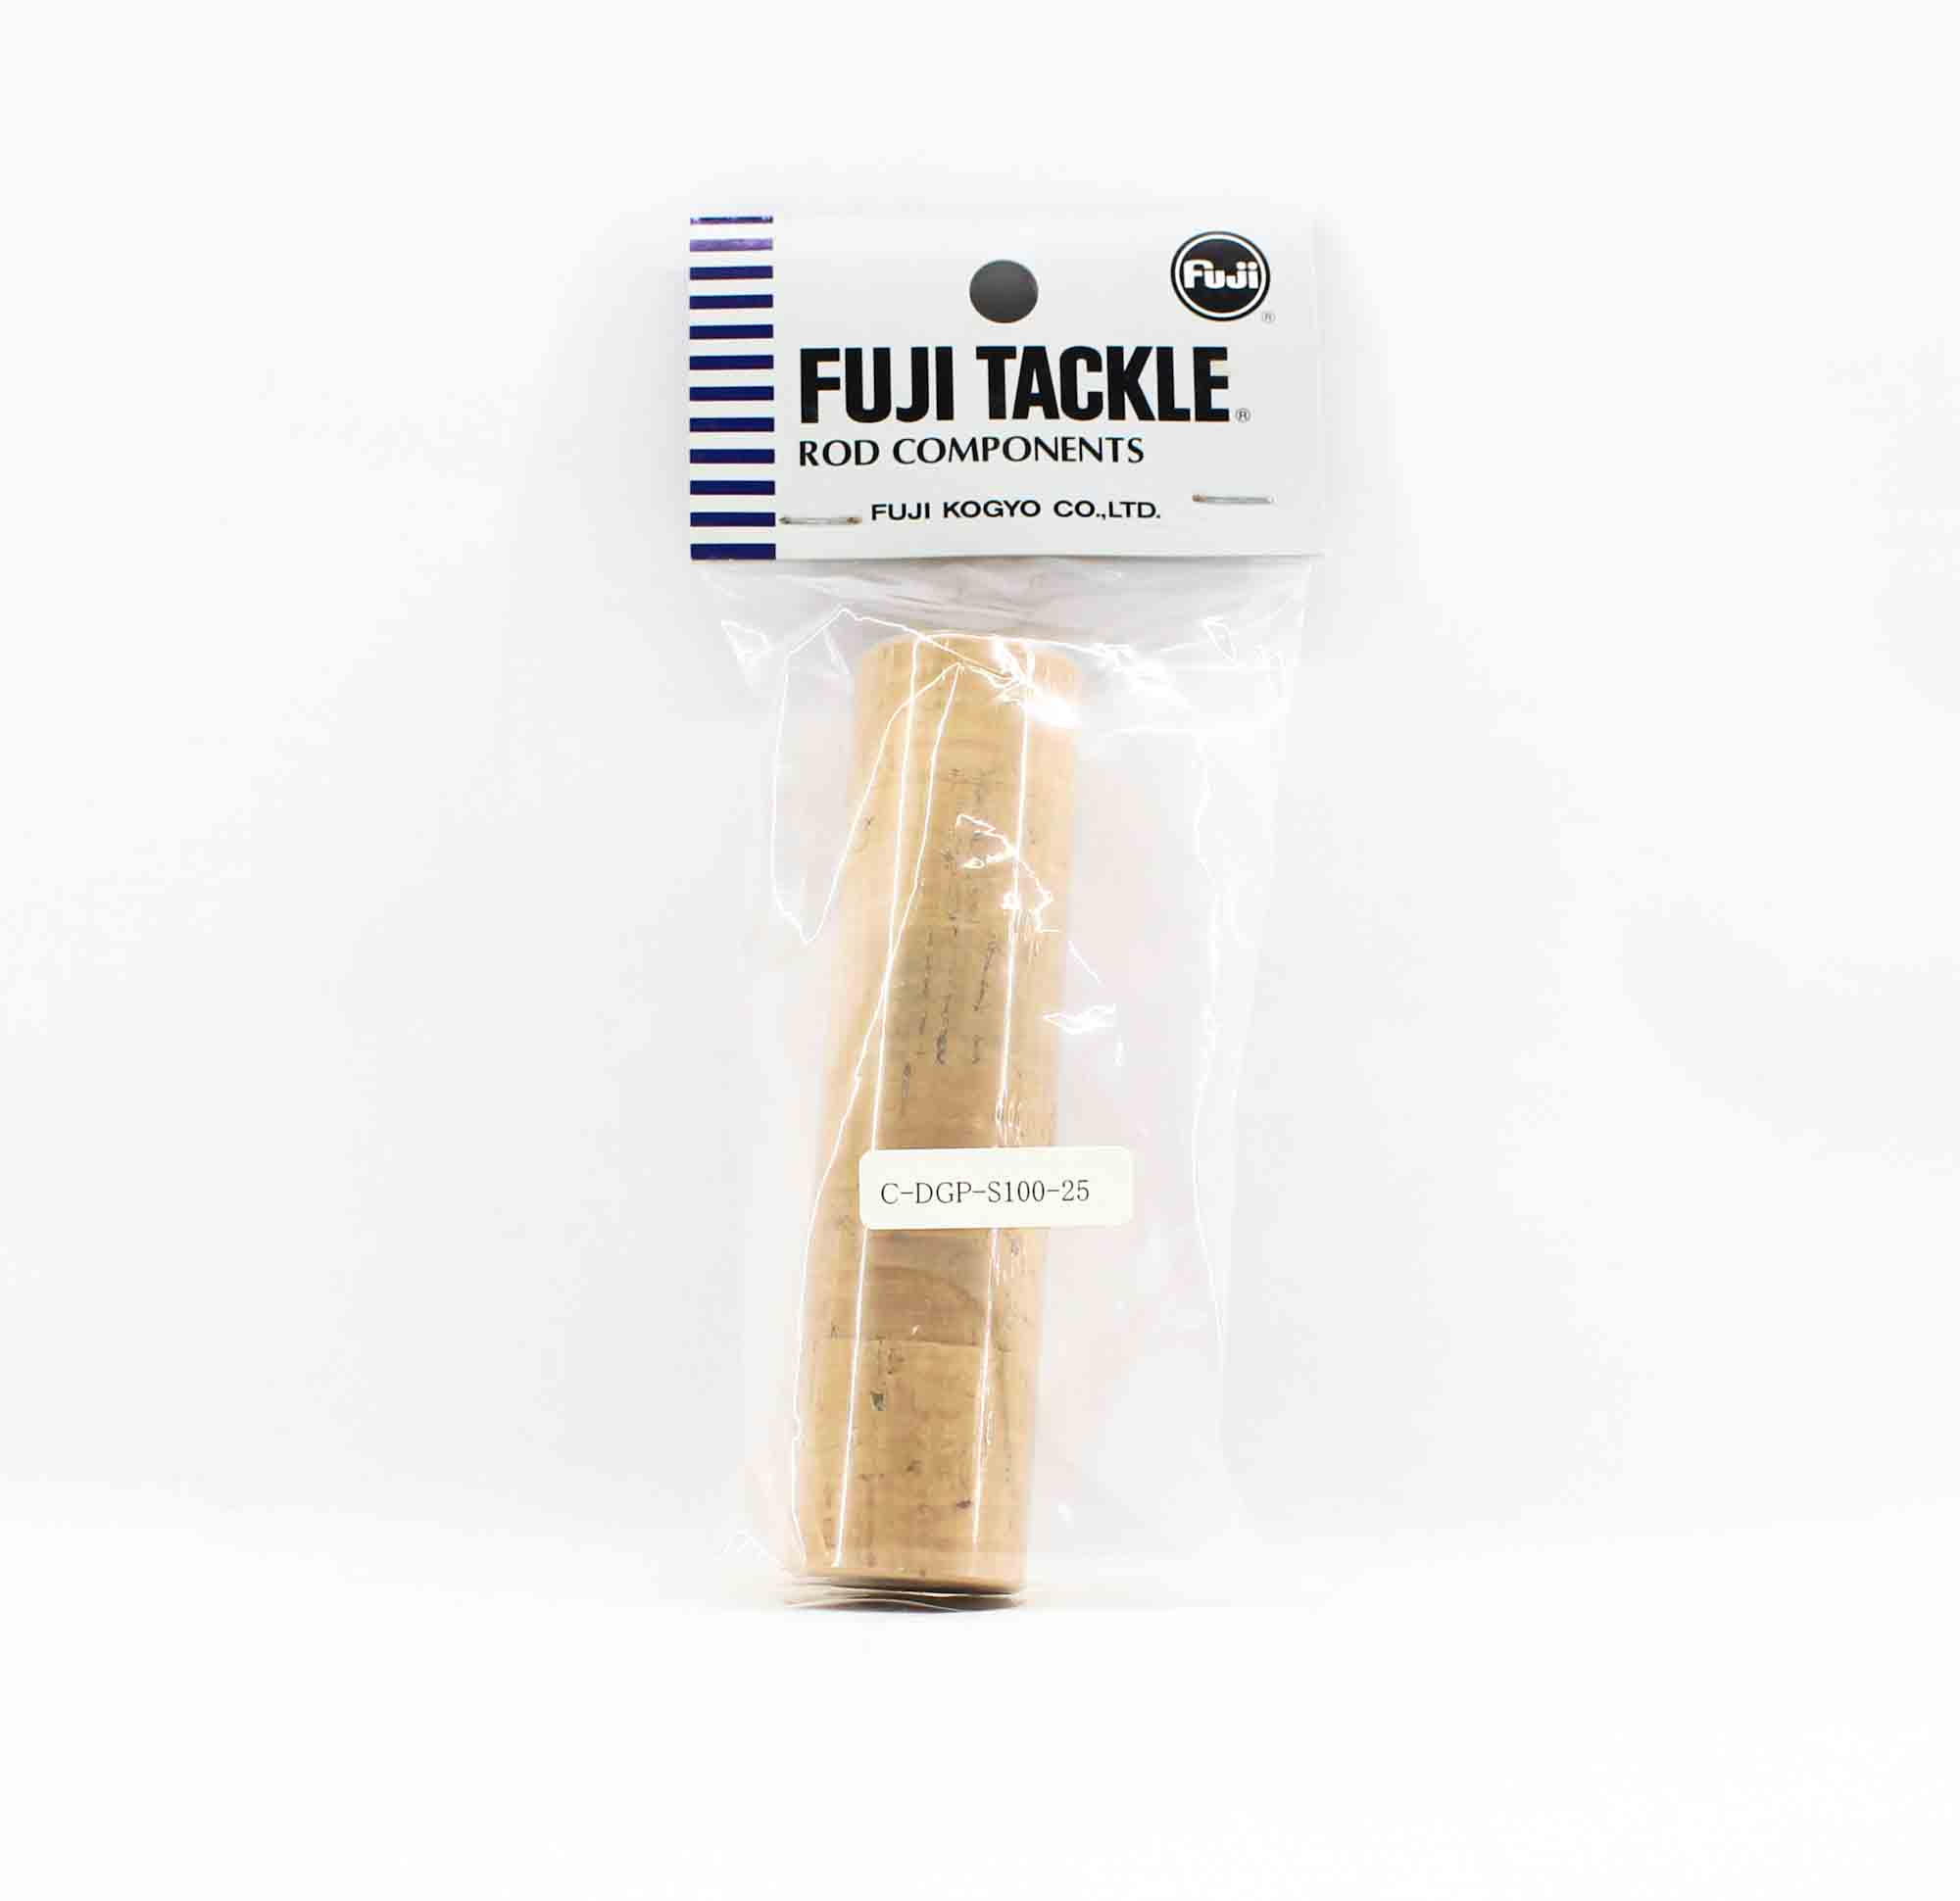 Fuji C-DGPS Size 100-25 Cork Rod Handle (6294)